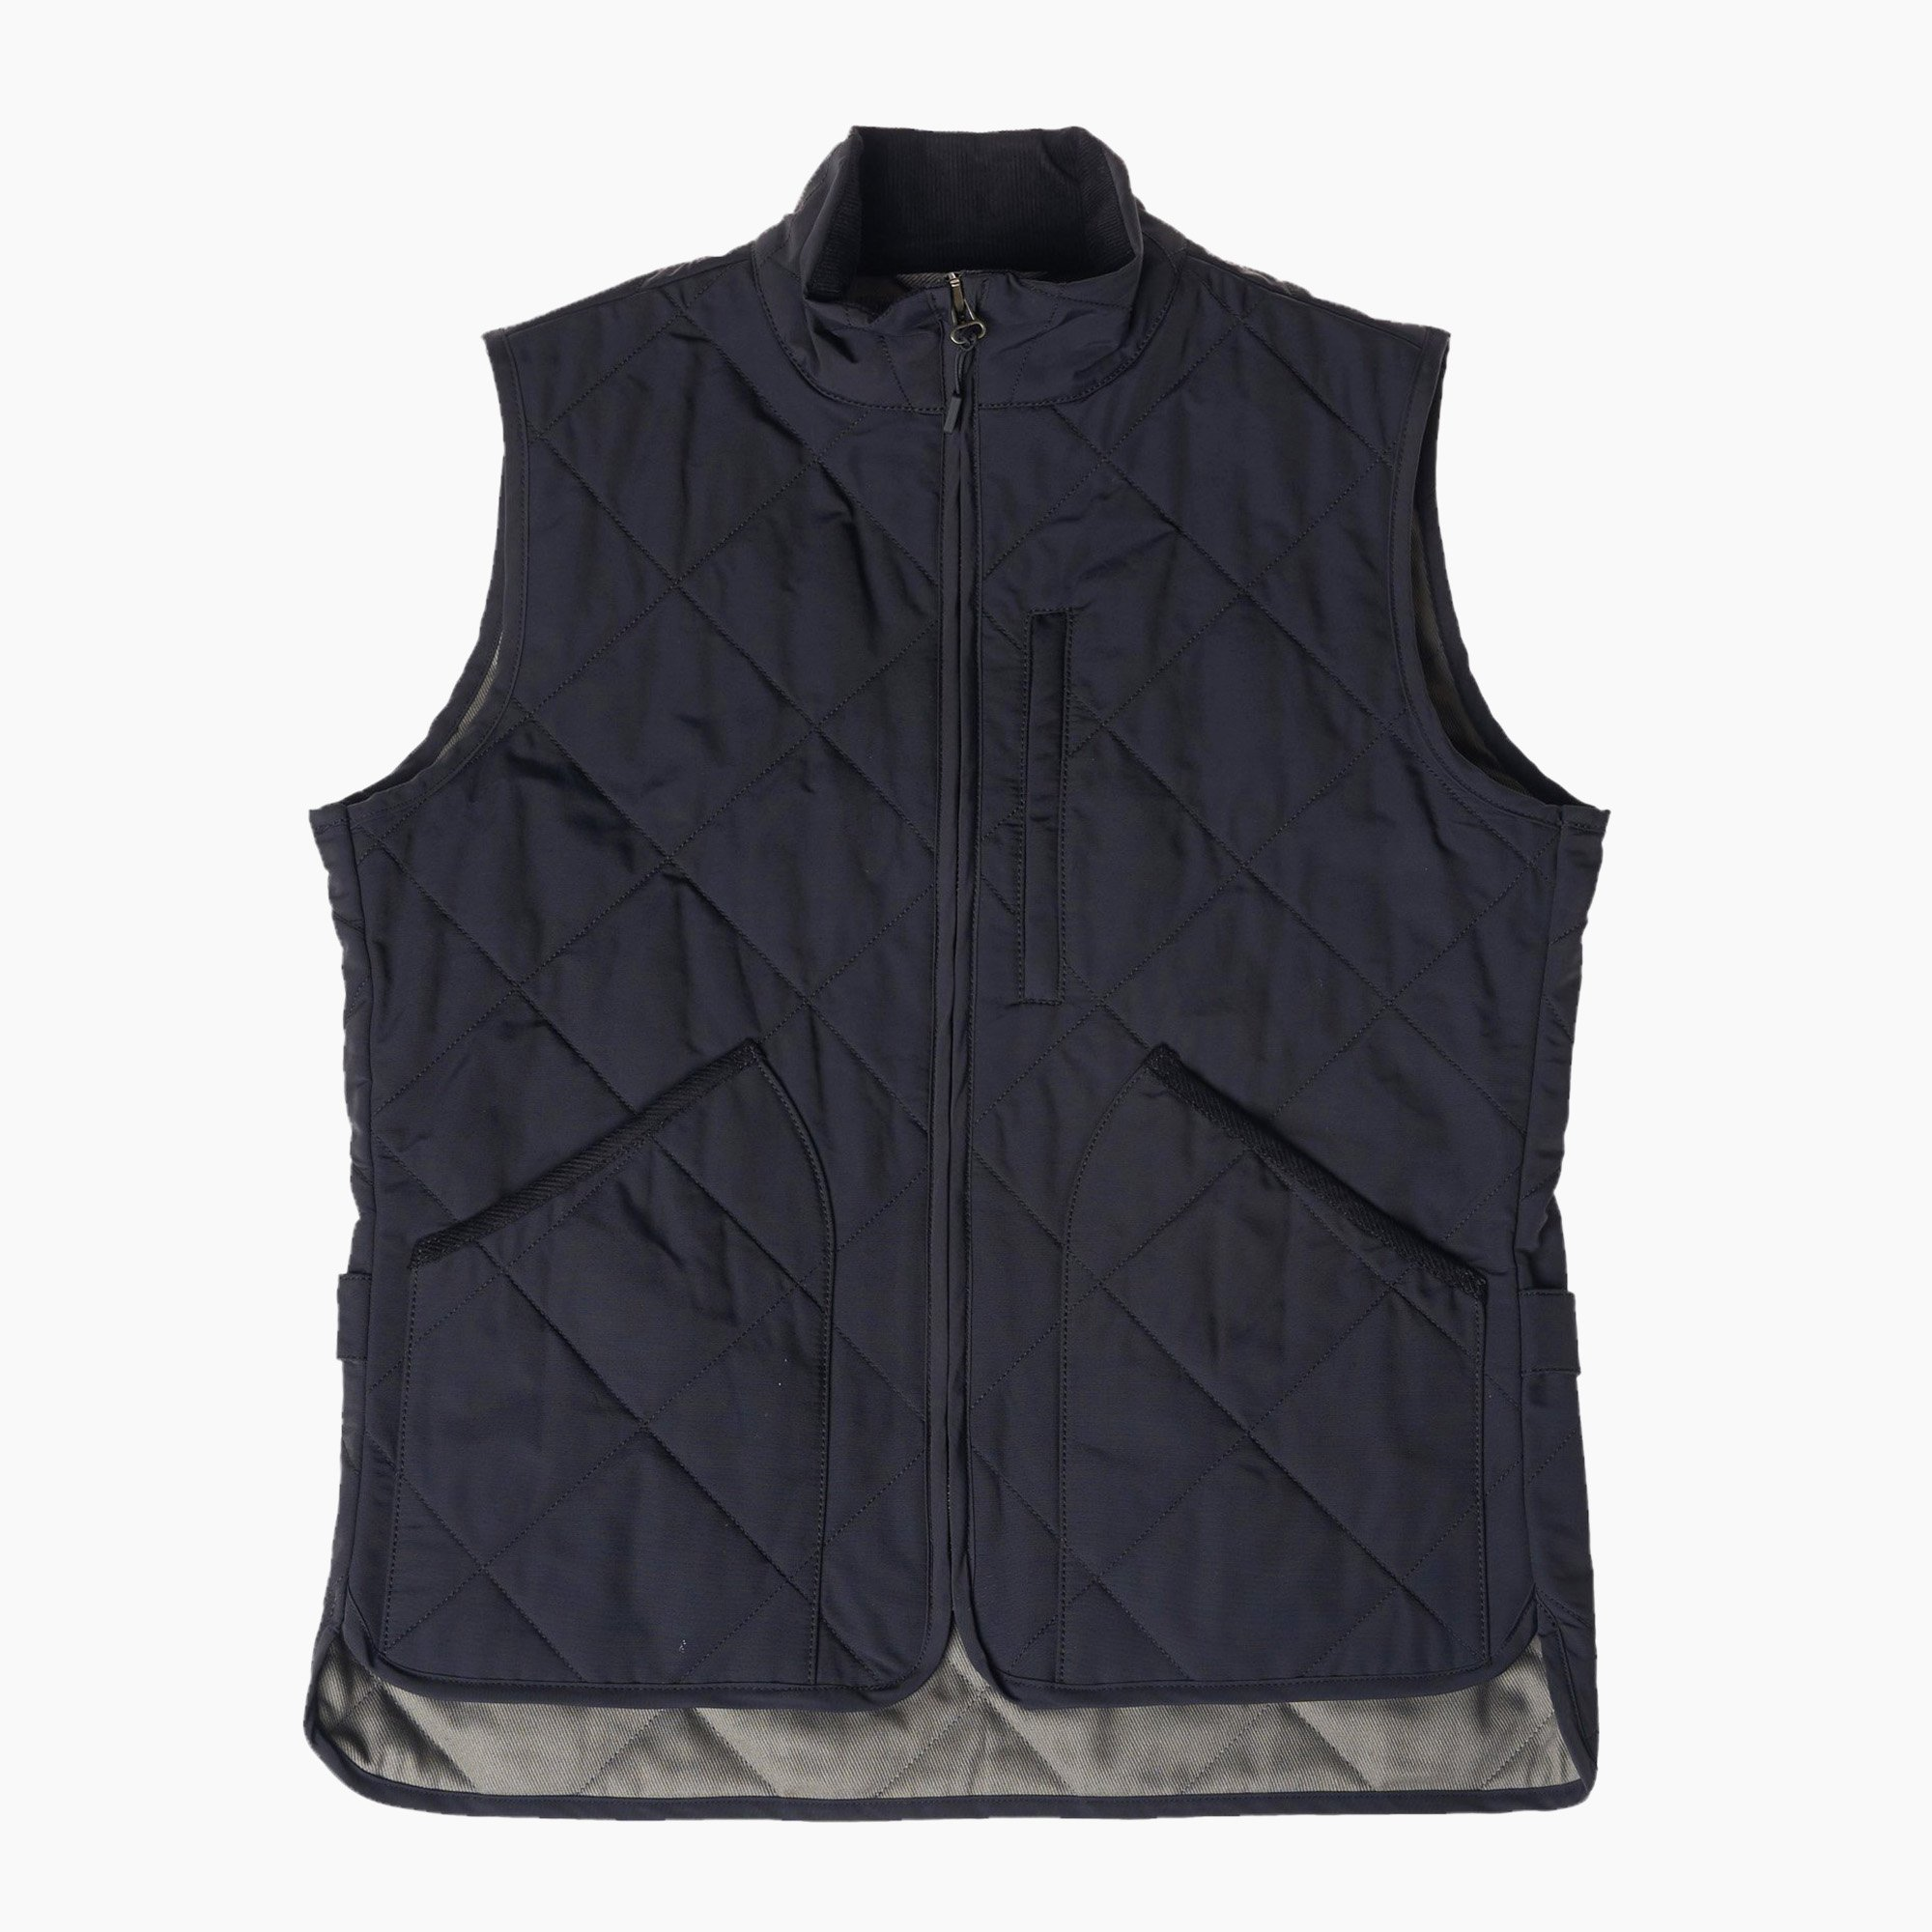 Peter Manning NYC Flatiron Quilted Vest